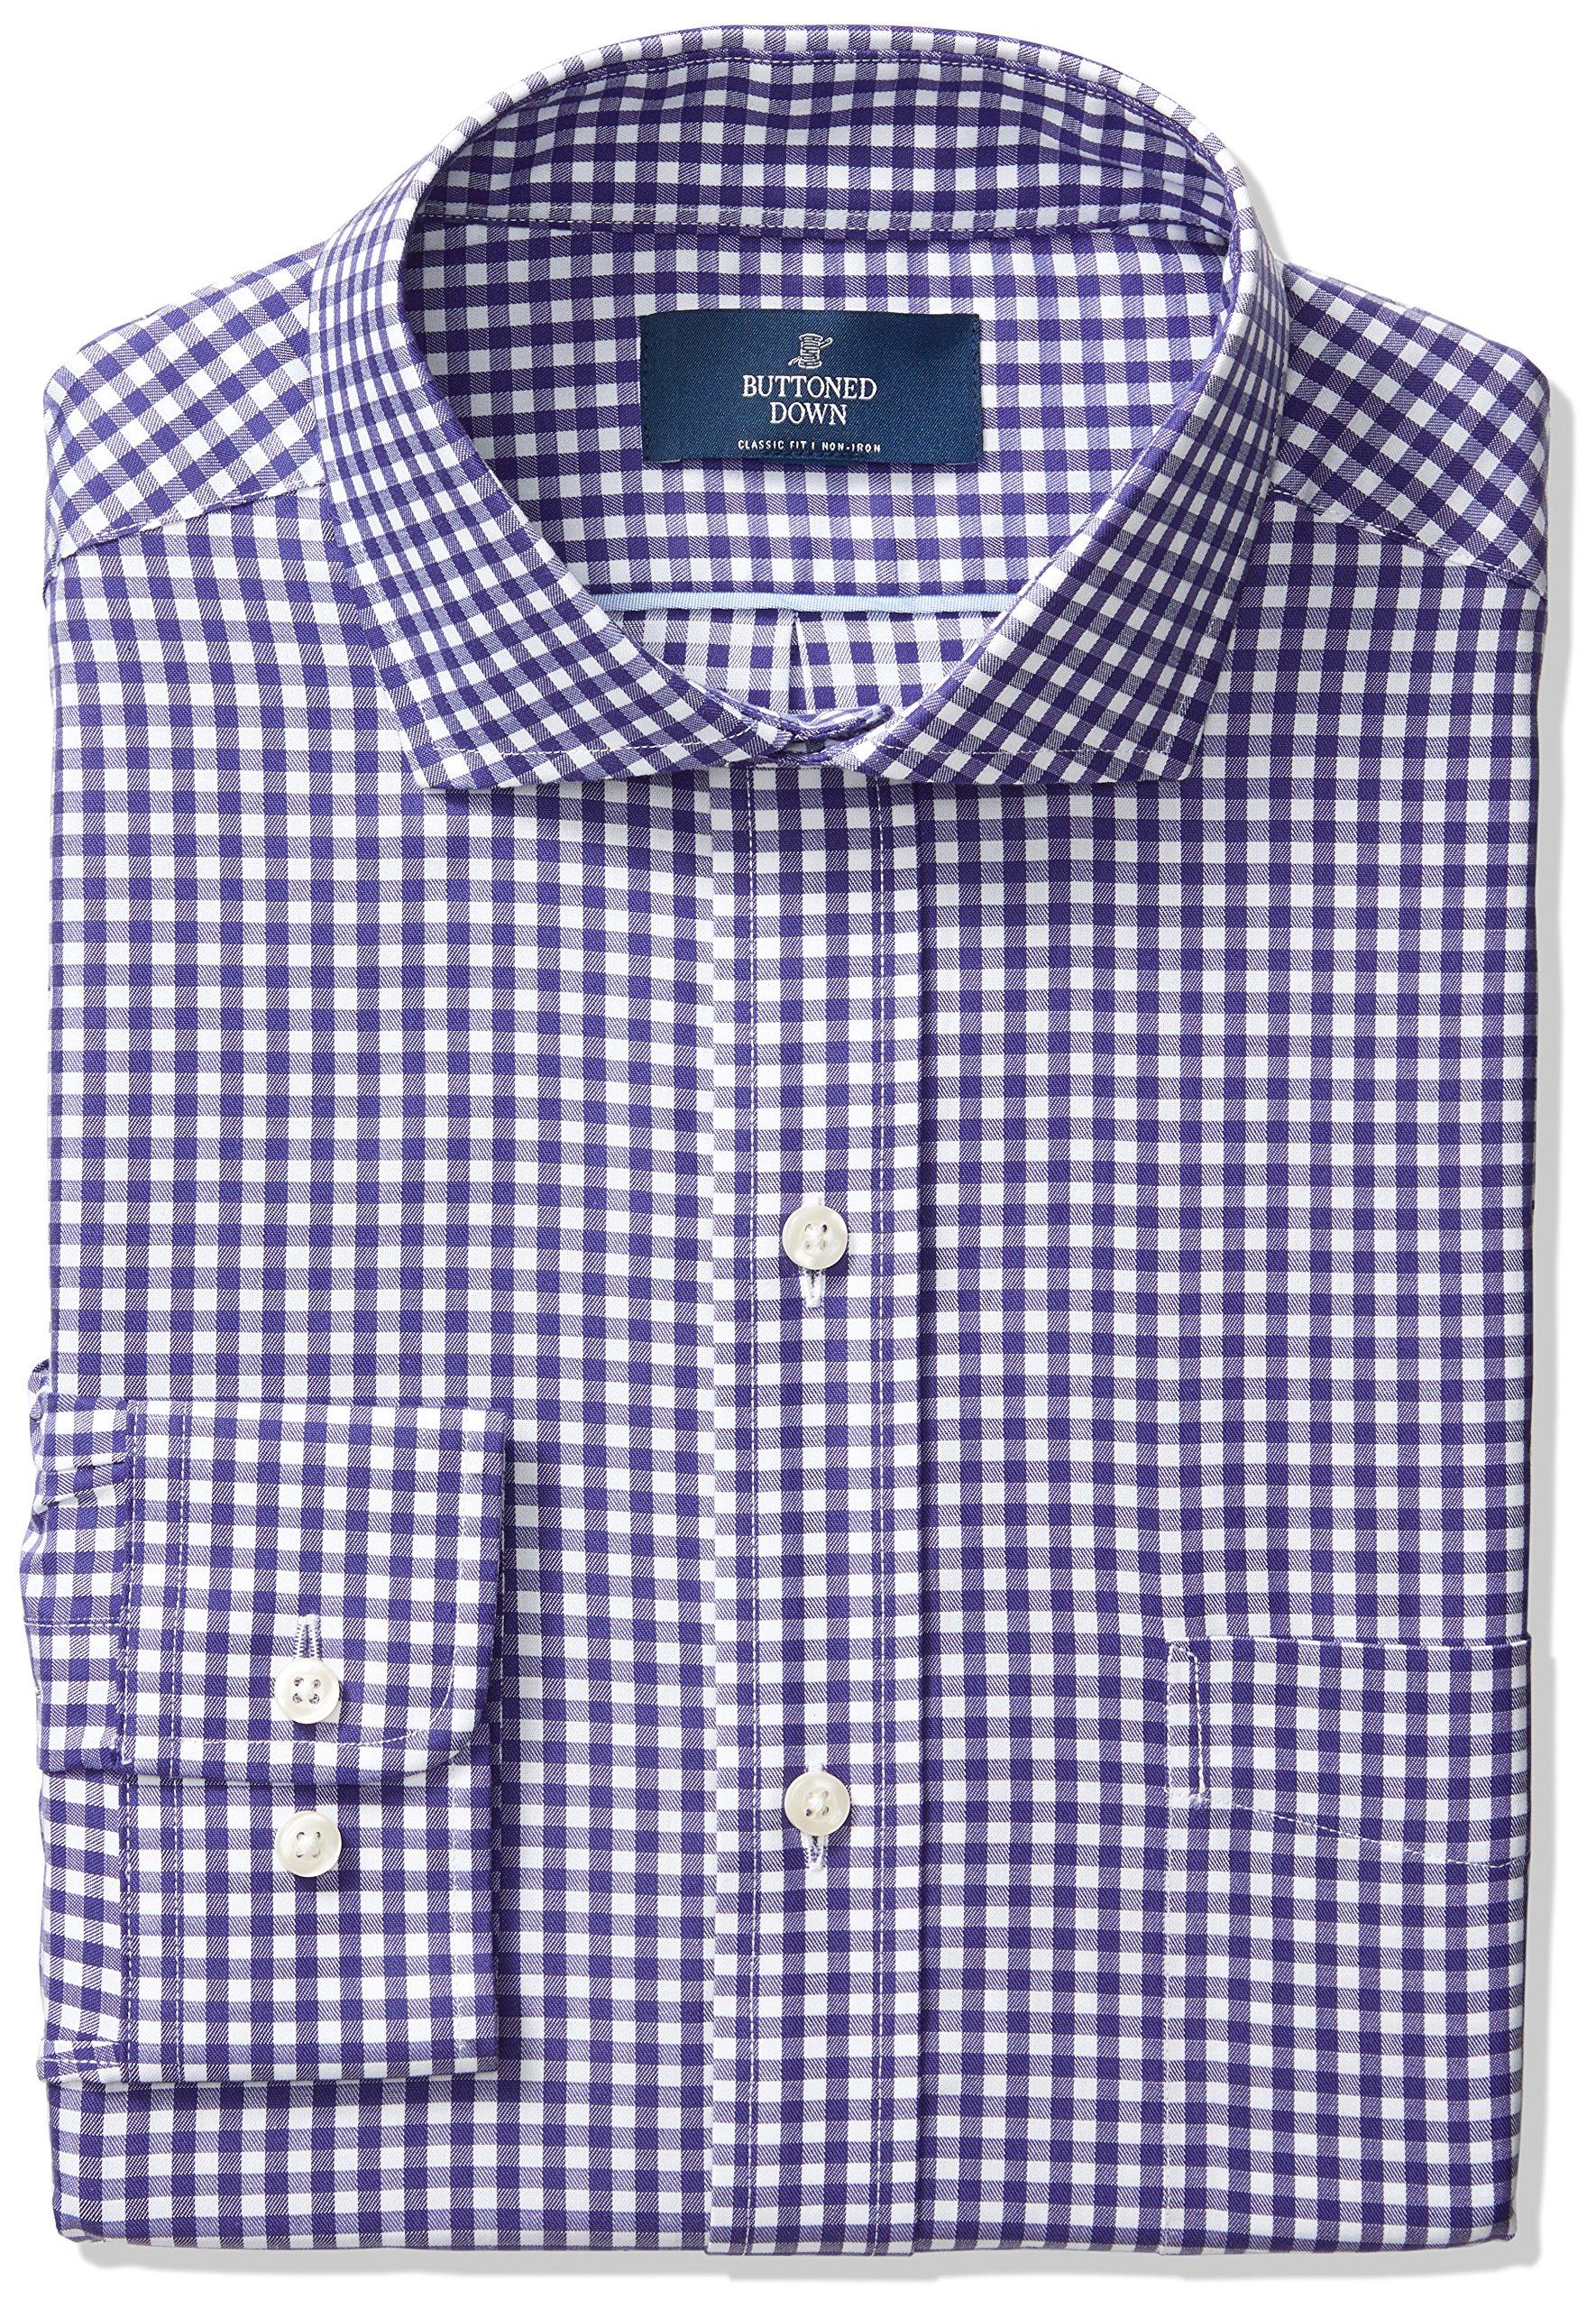 Buttoned Down Men's Classic Fit Cutaway-Collar Non-Iron Dress Shirt, Medium Purple Gingham, 17.5'' Neck 33'' Sleeve